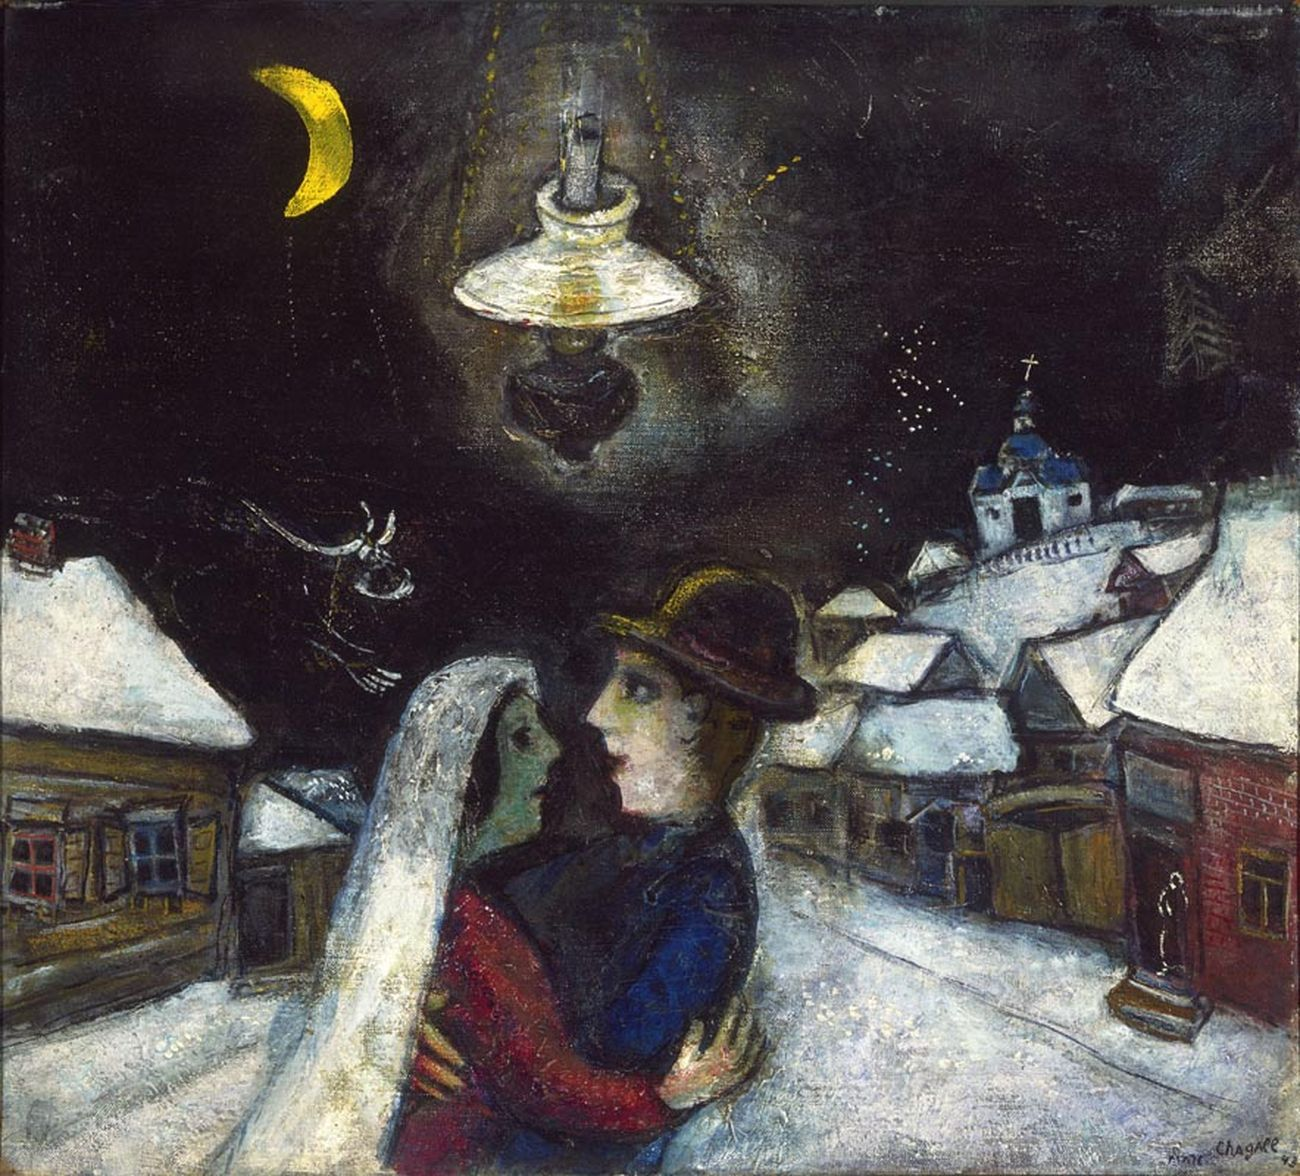 Marc Chagall, Nella notte (1943; olio su tela, 47 x 52,4 cm; Filadelfia, Philadelphia Museum of Art)